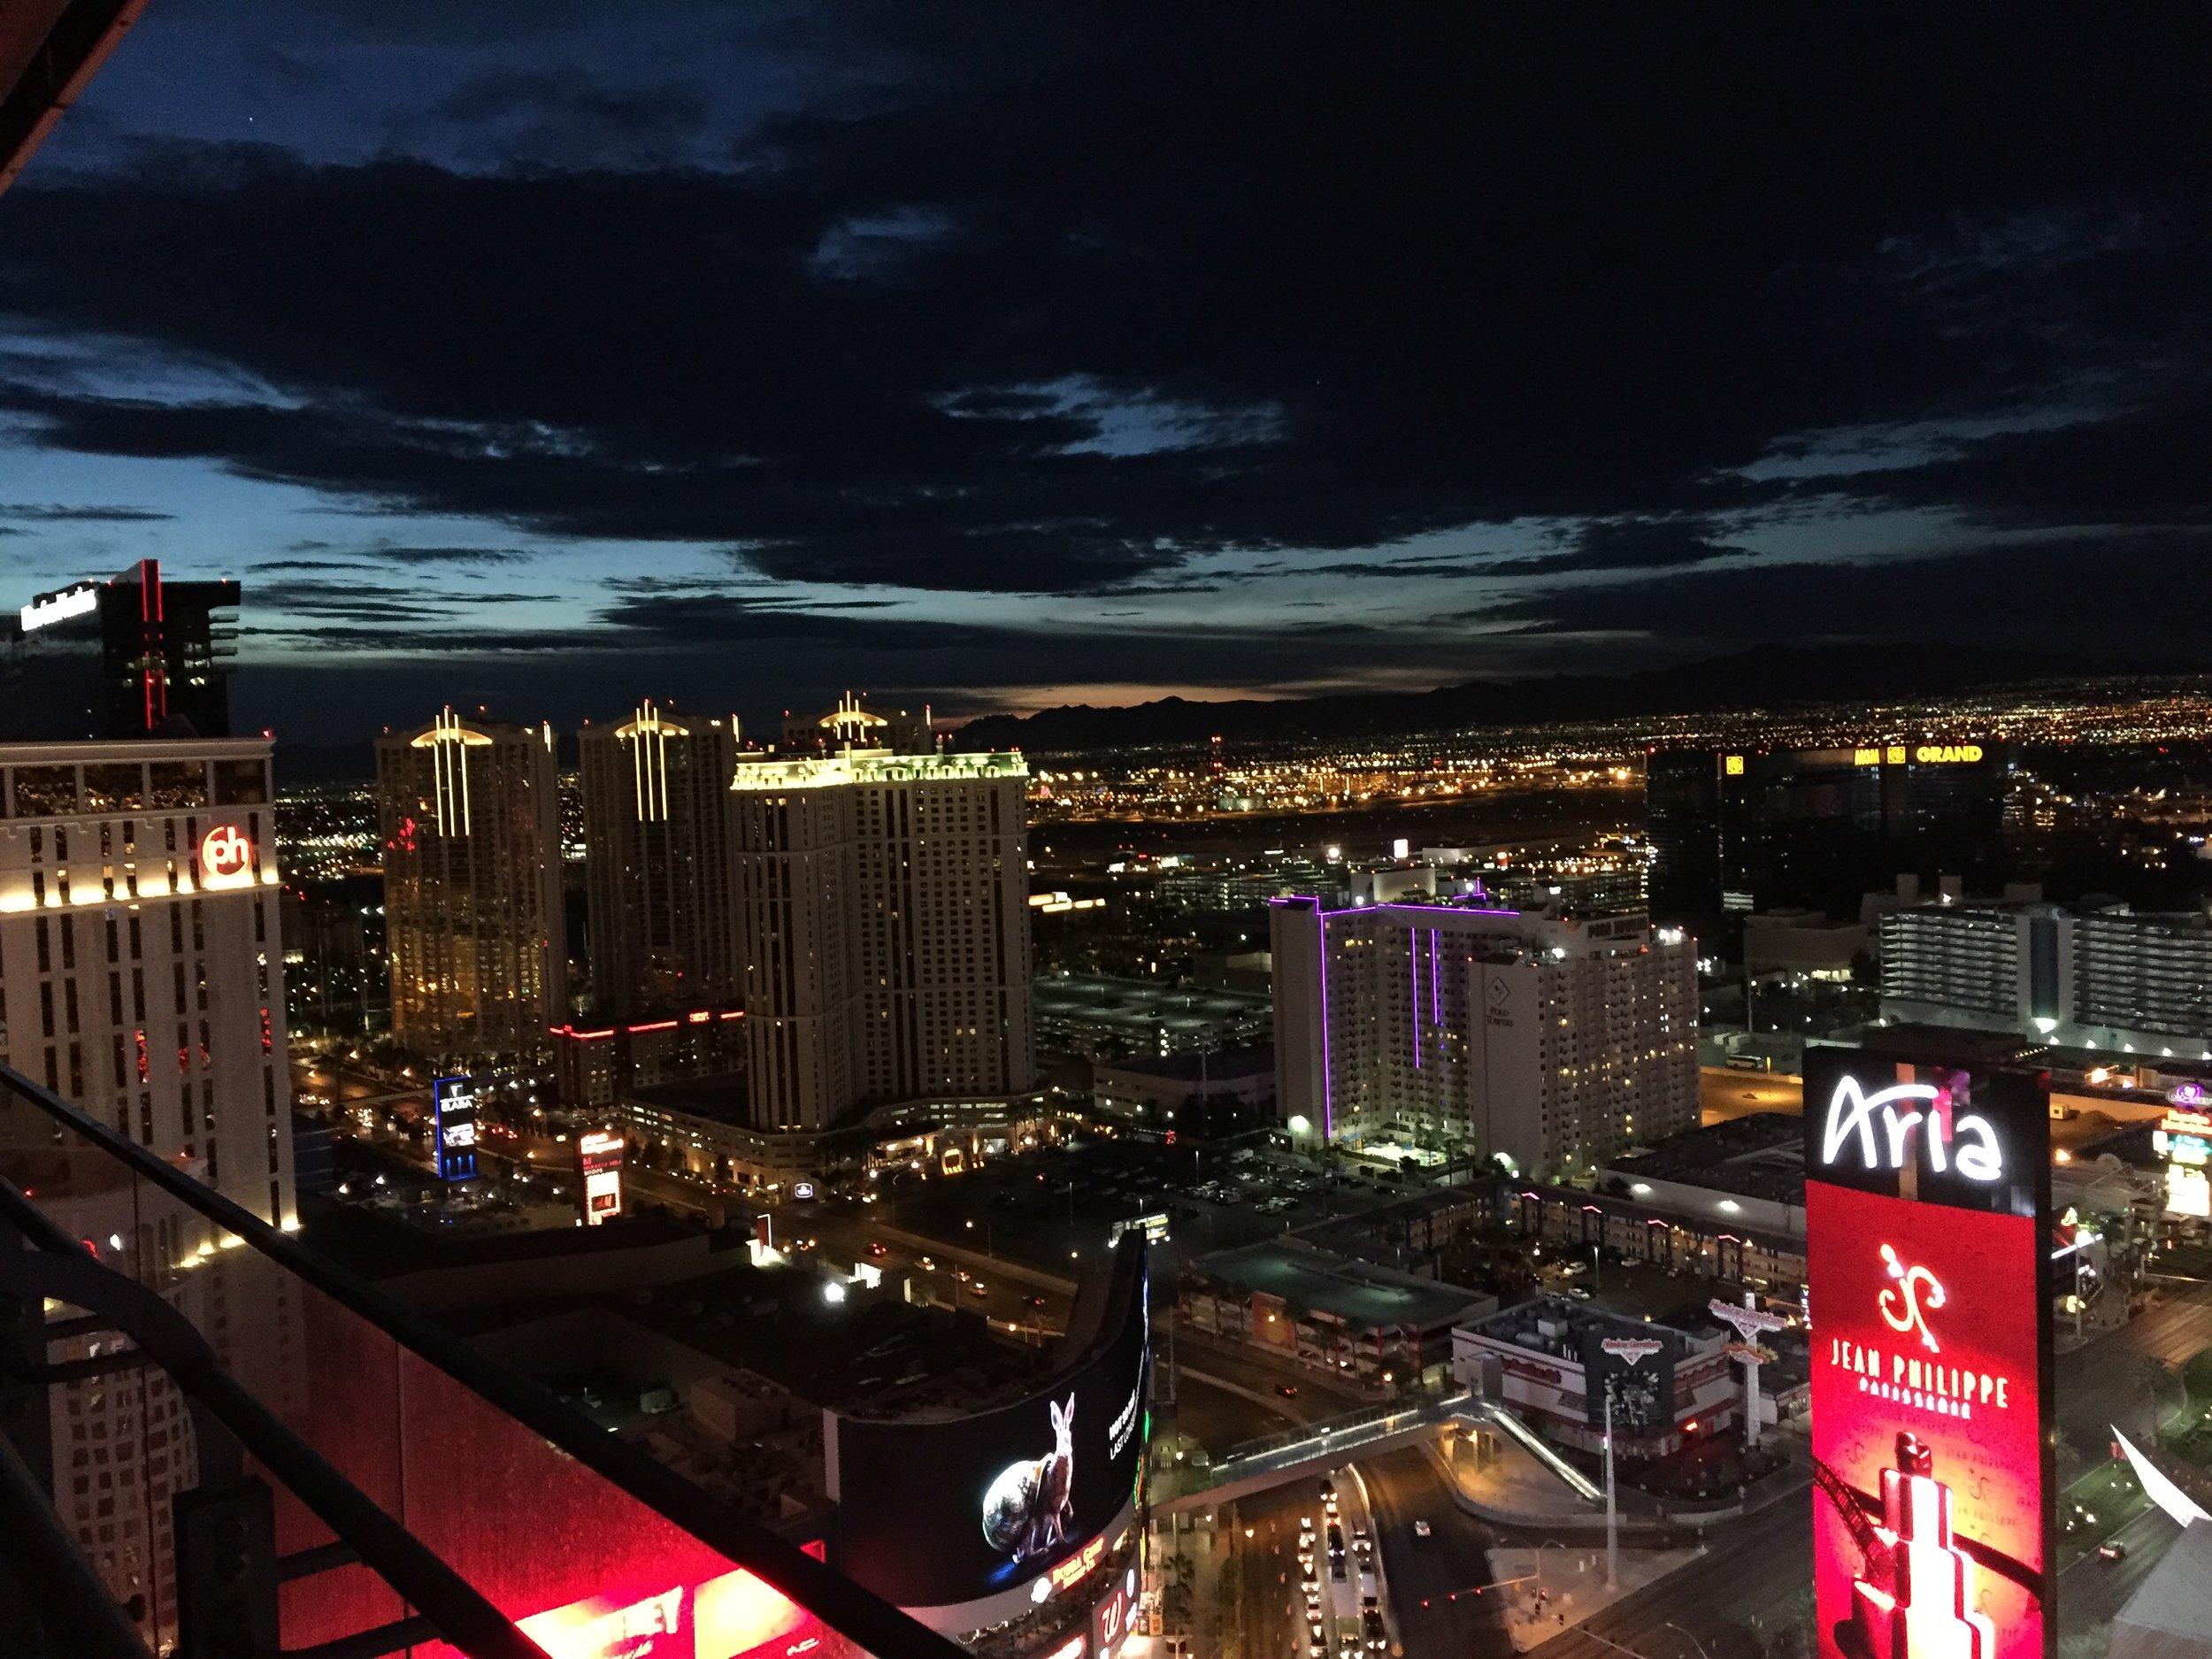 Sunrises in Vegas are pretty impressive, I must admit.